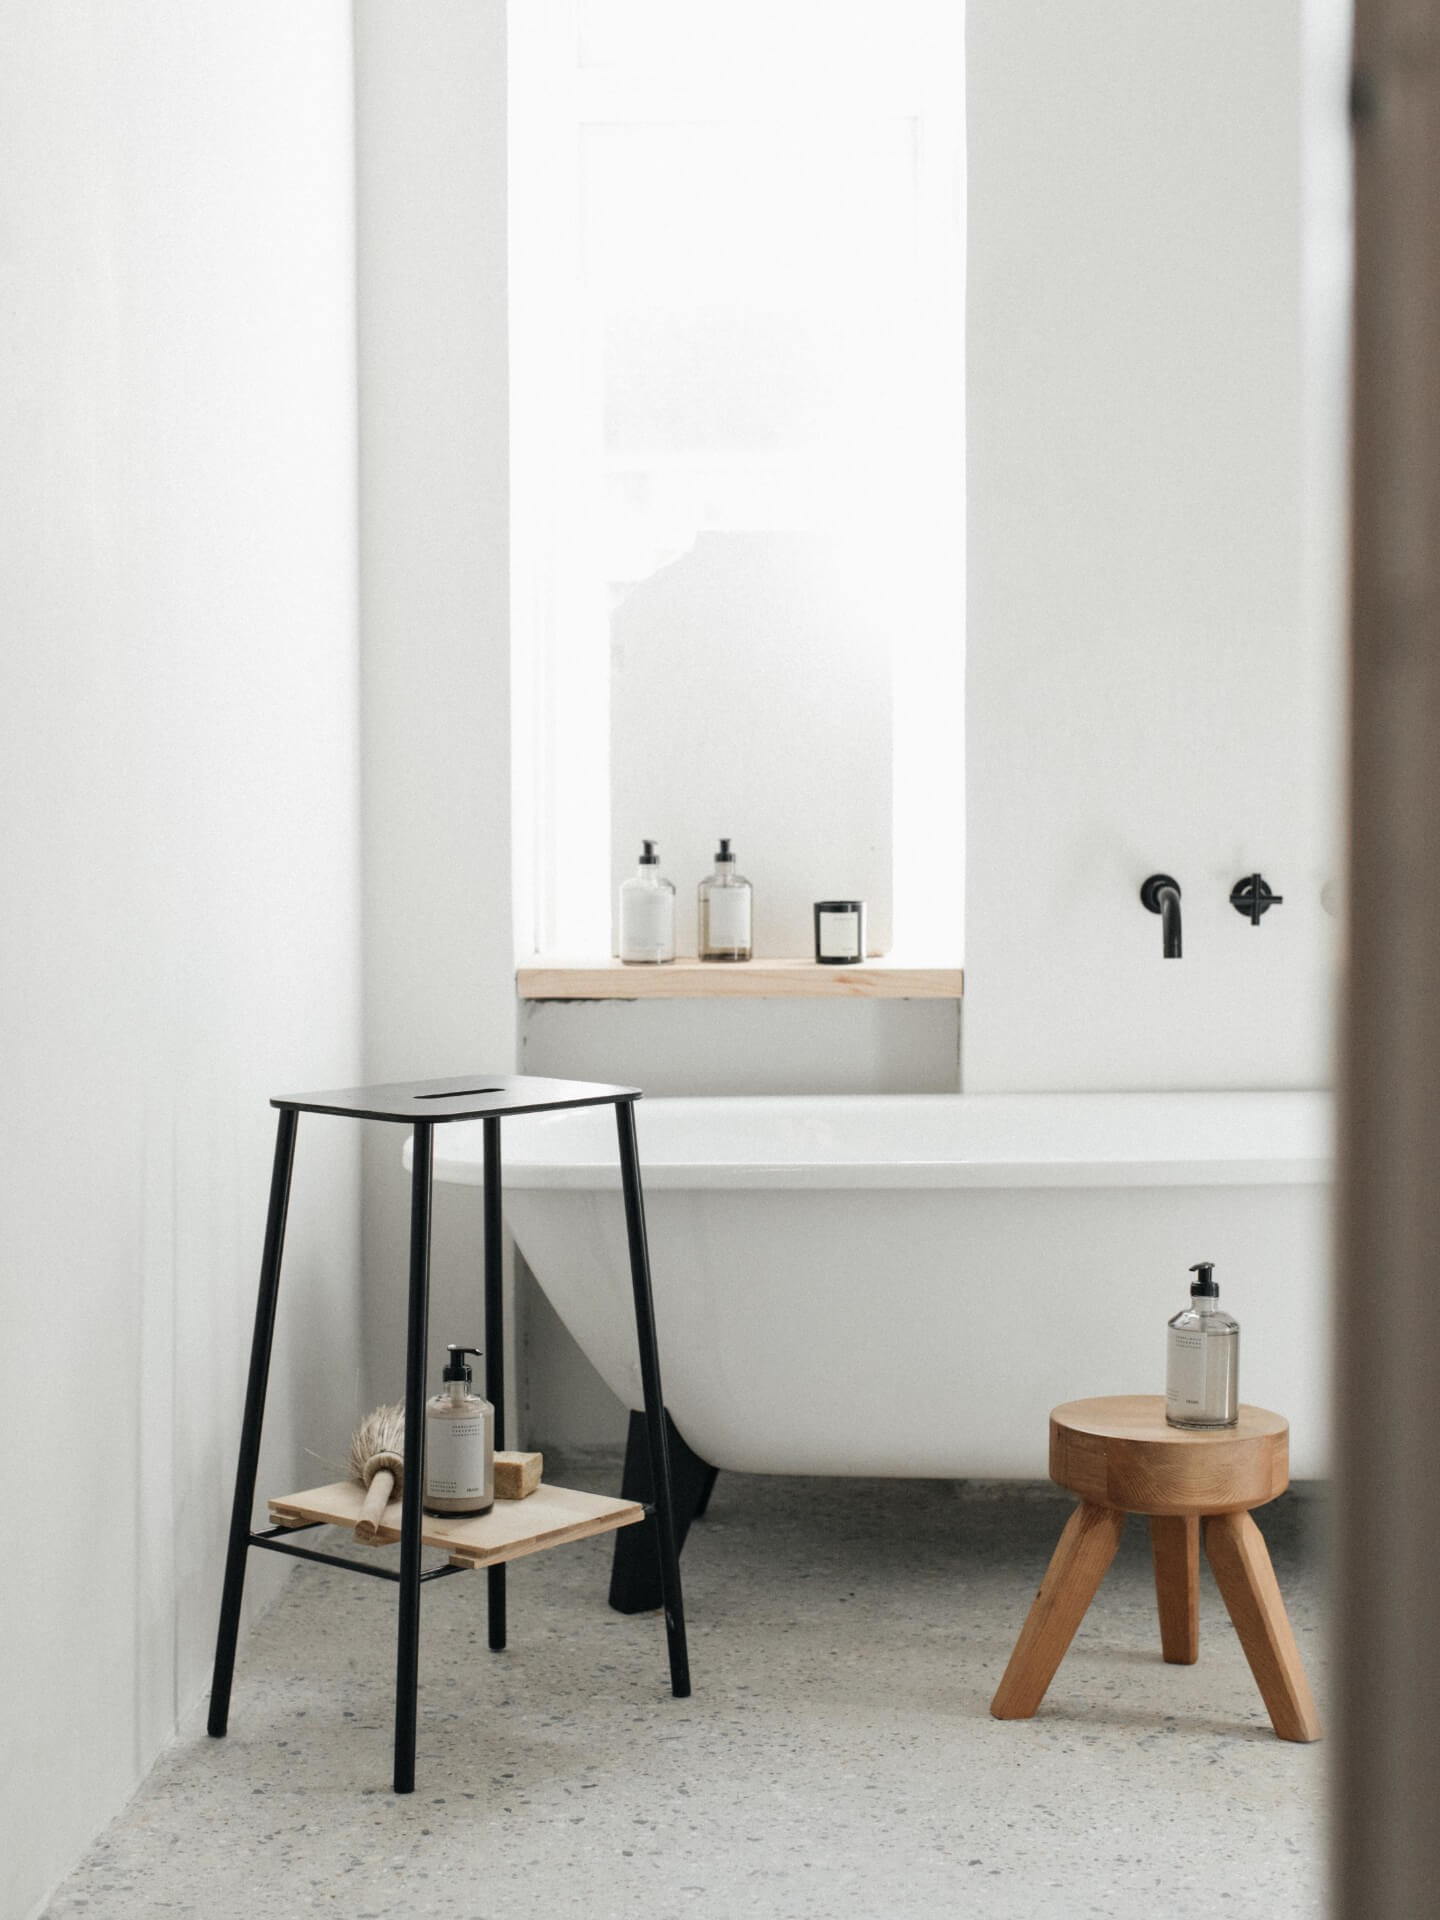 Miljøbilde Frama bad. Sement på gulv med detaljer i eik, krakk til bad, håndsåpe og sort armatur.